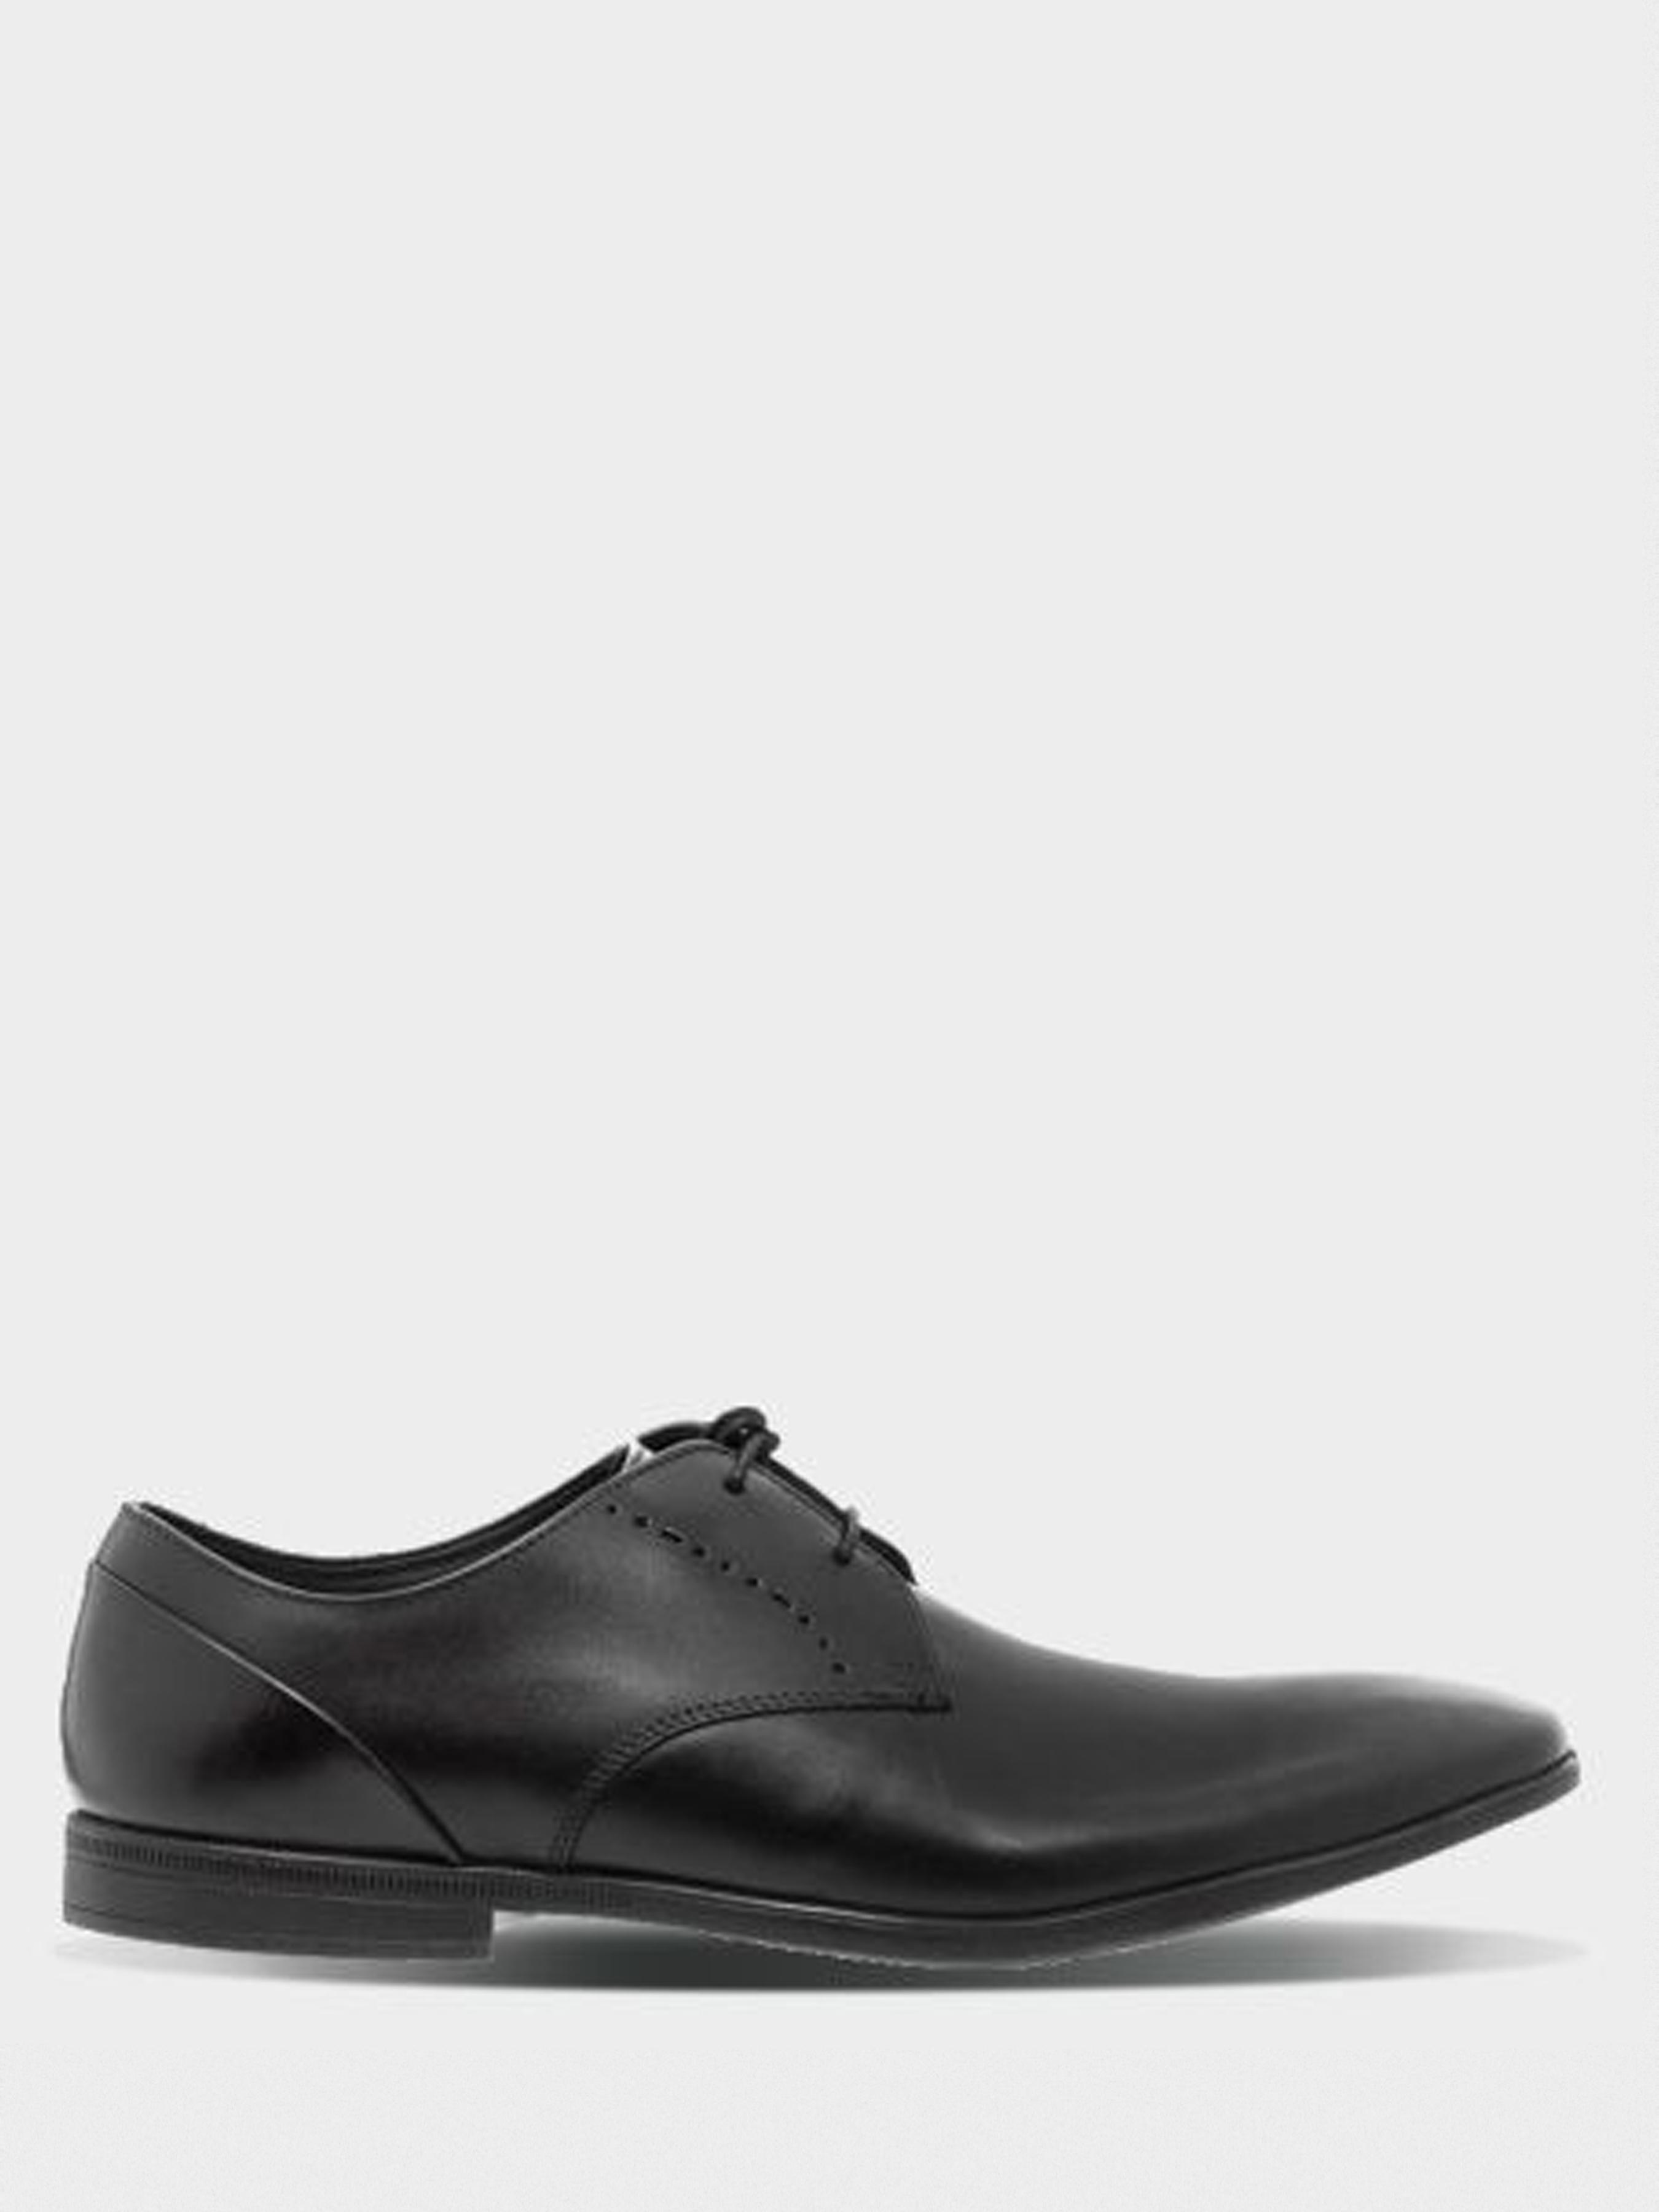 Туфли мужские Clarks Bampton Lace OM2668 цена обуви, 2017